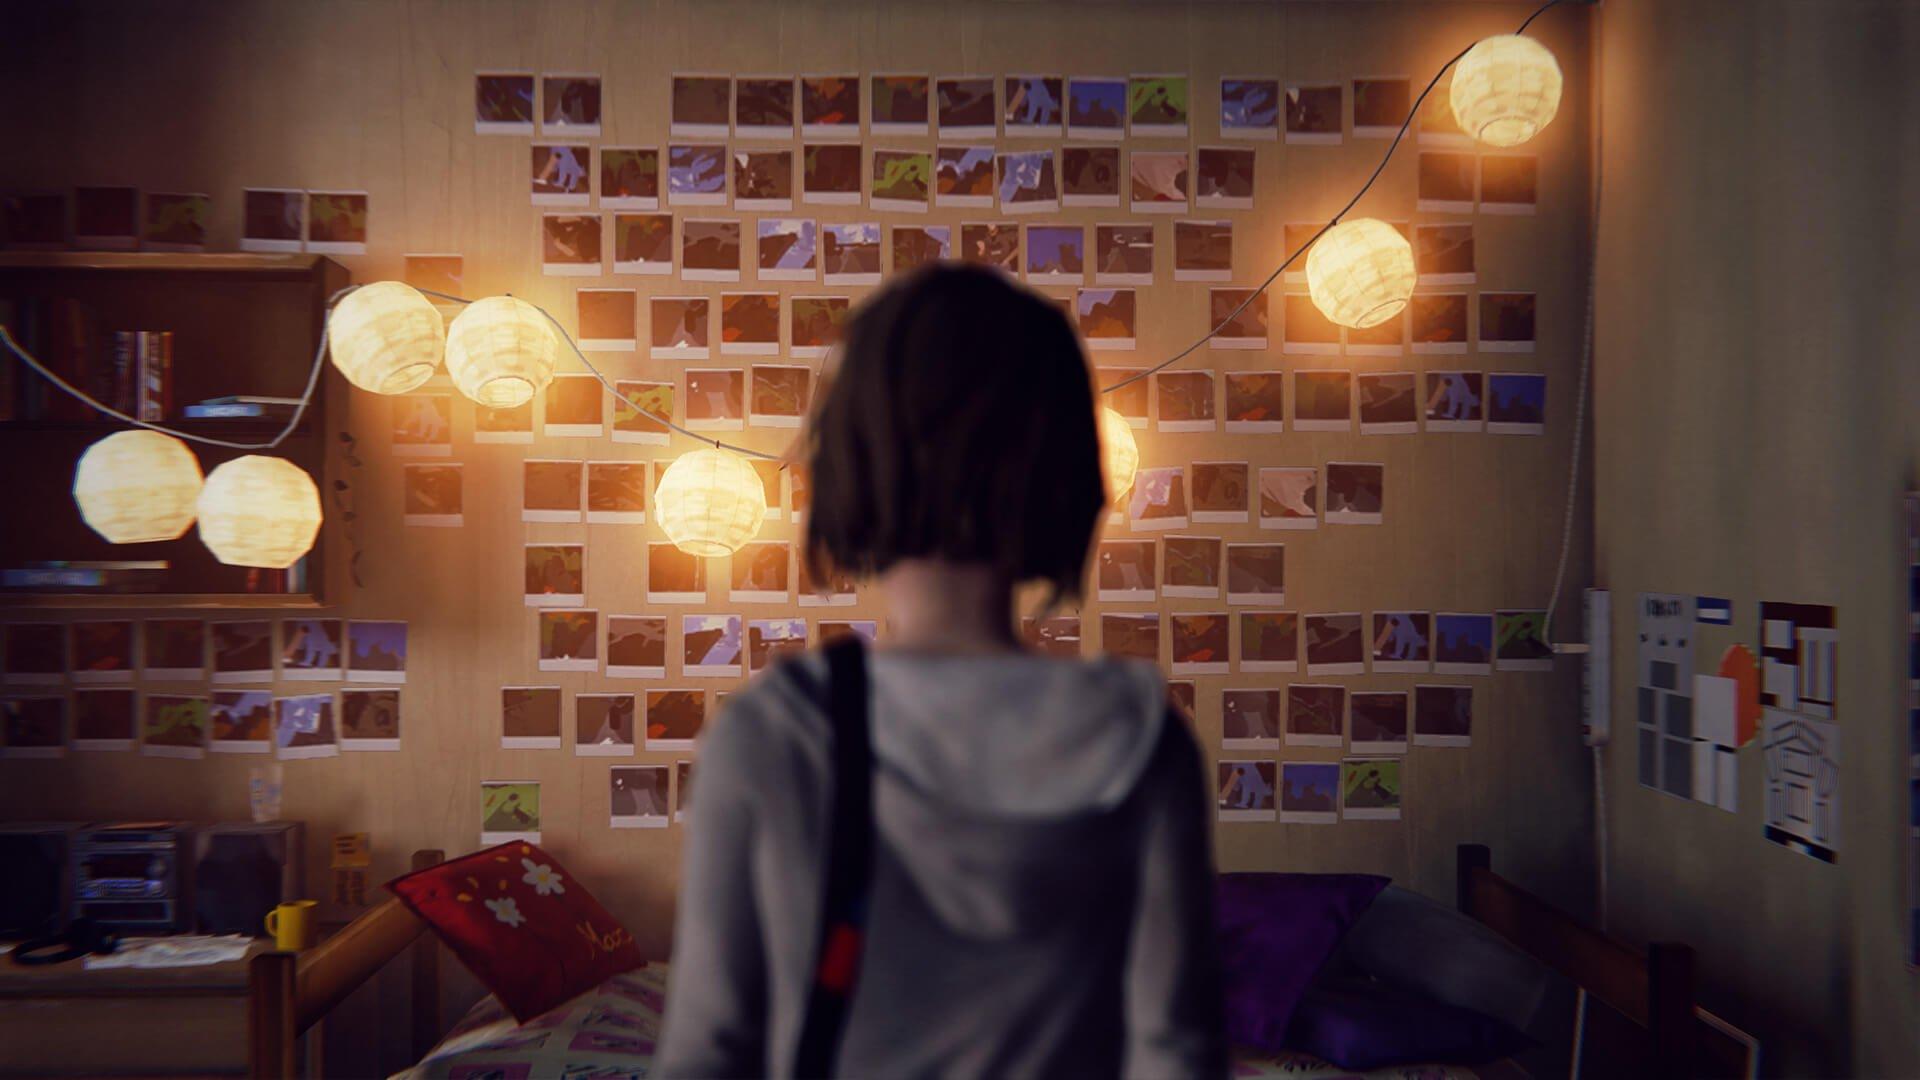 life-is-strange-gameplay-screenshot-max-bedroom-ps4-xbox-one-pc